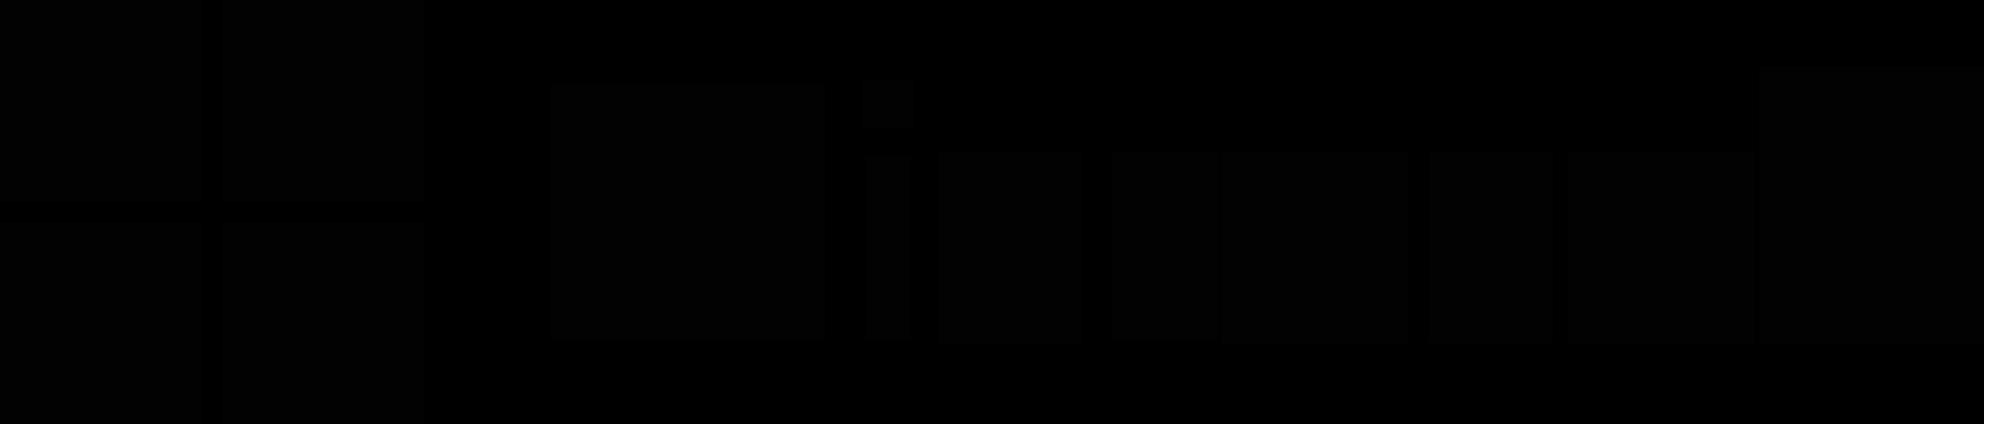 Microsoft Logo Black.png